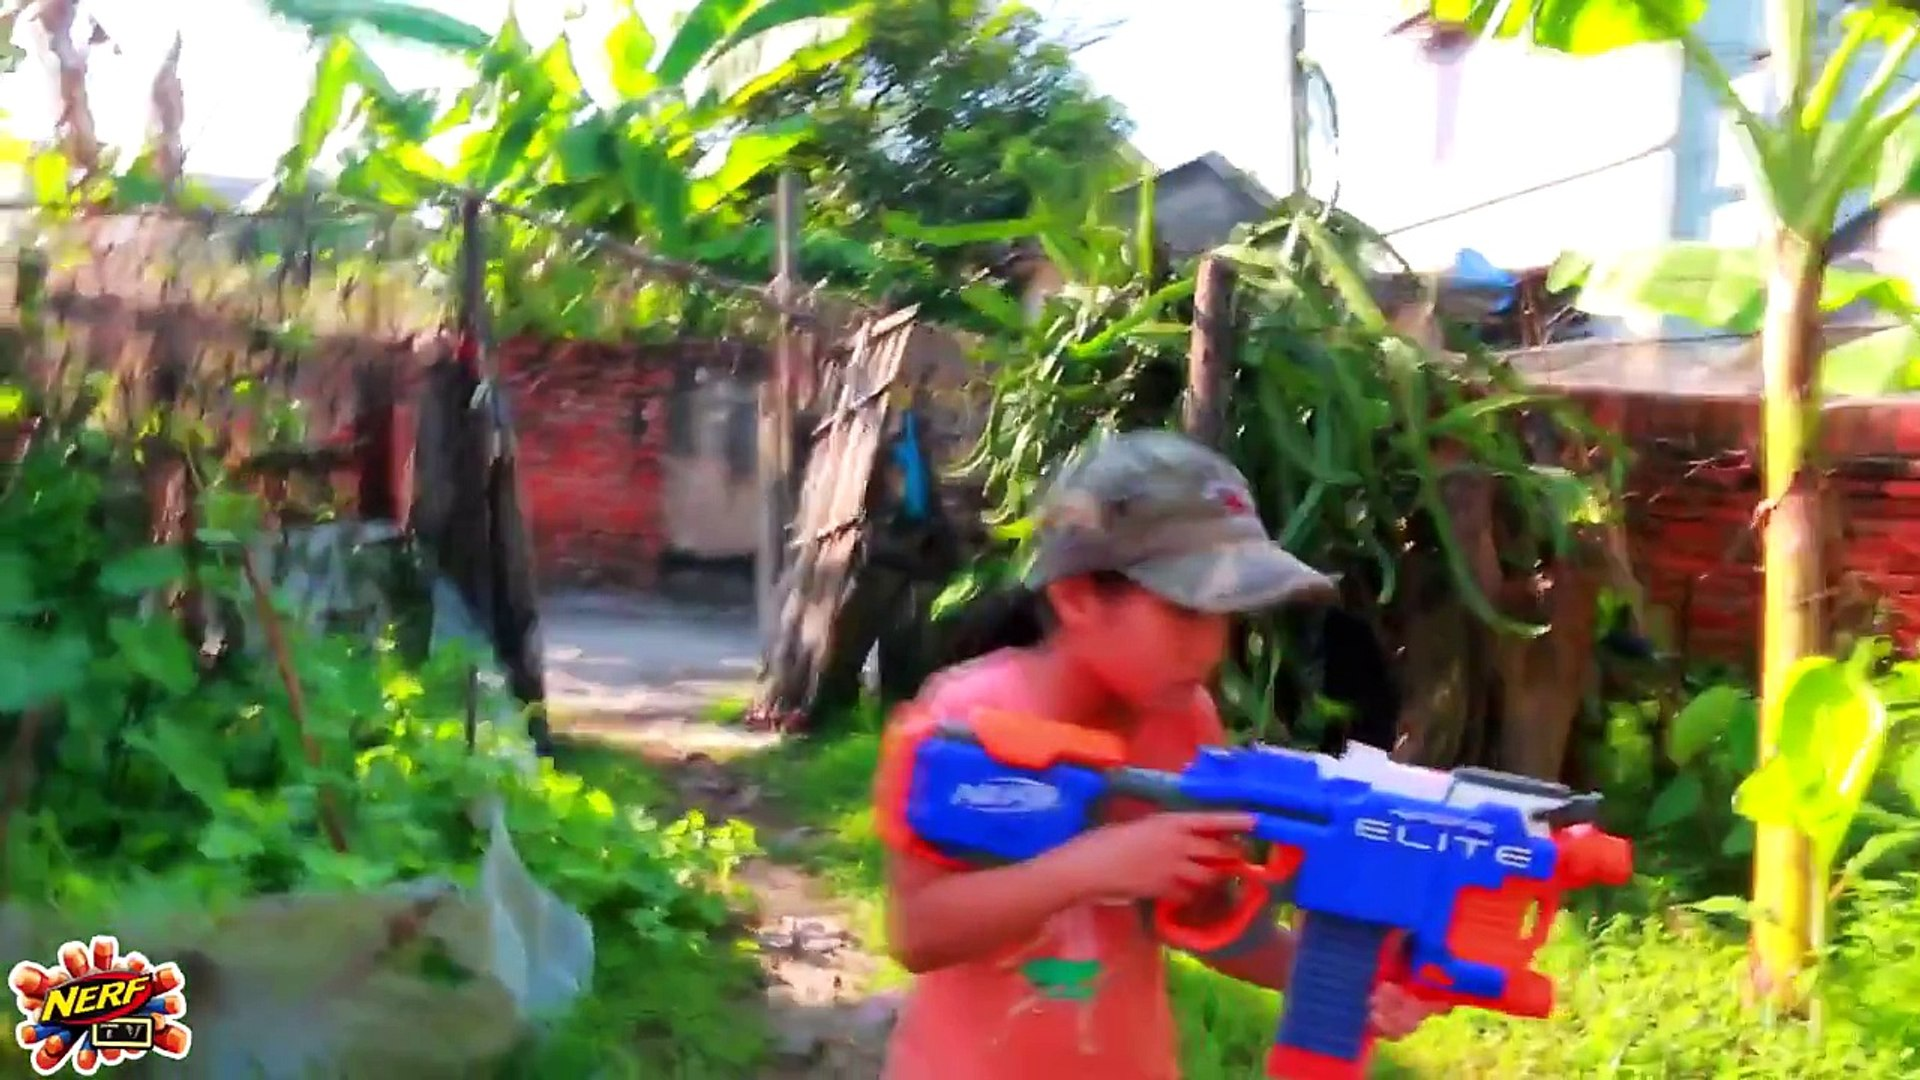 Gun & Gun - Superheroes Action Movie Nerf Guns baby girls vs girls -The Underdog 1 _GUN BABY 11